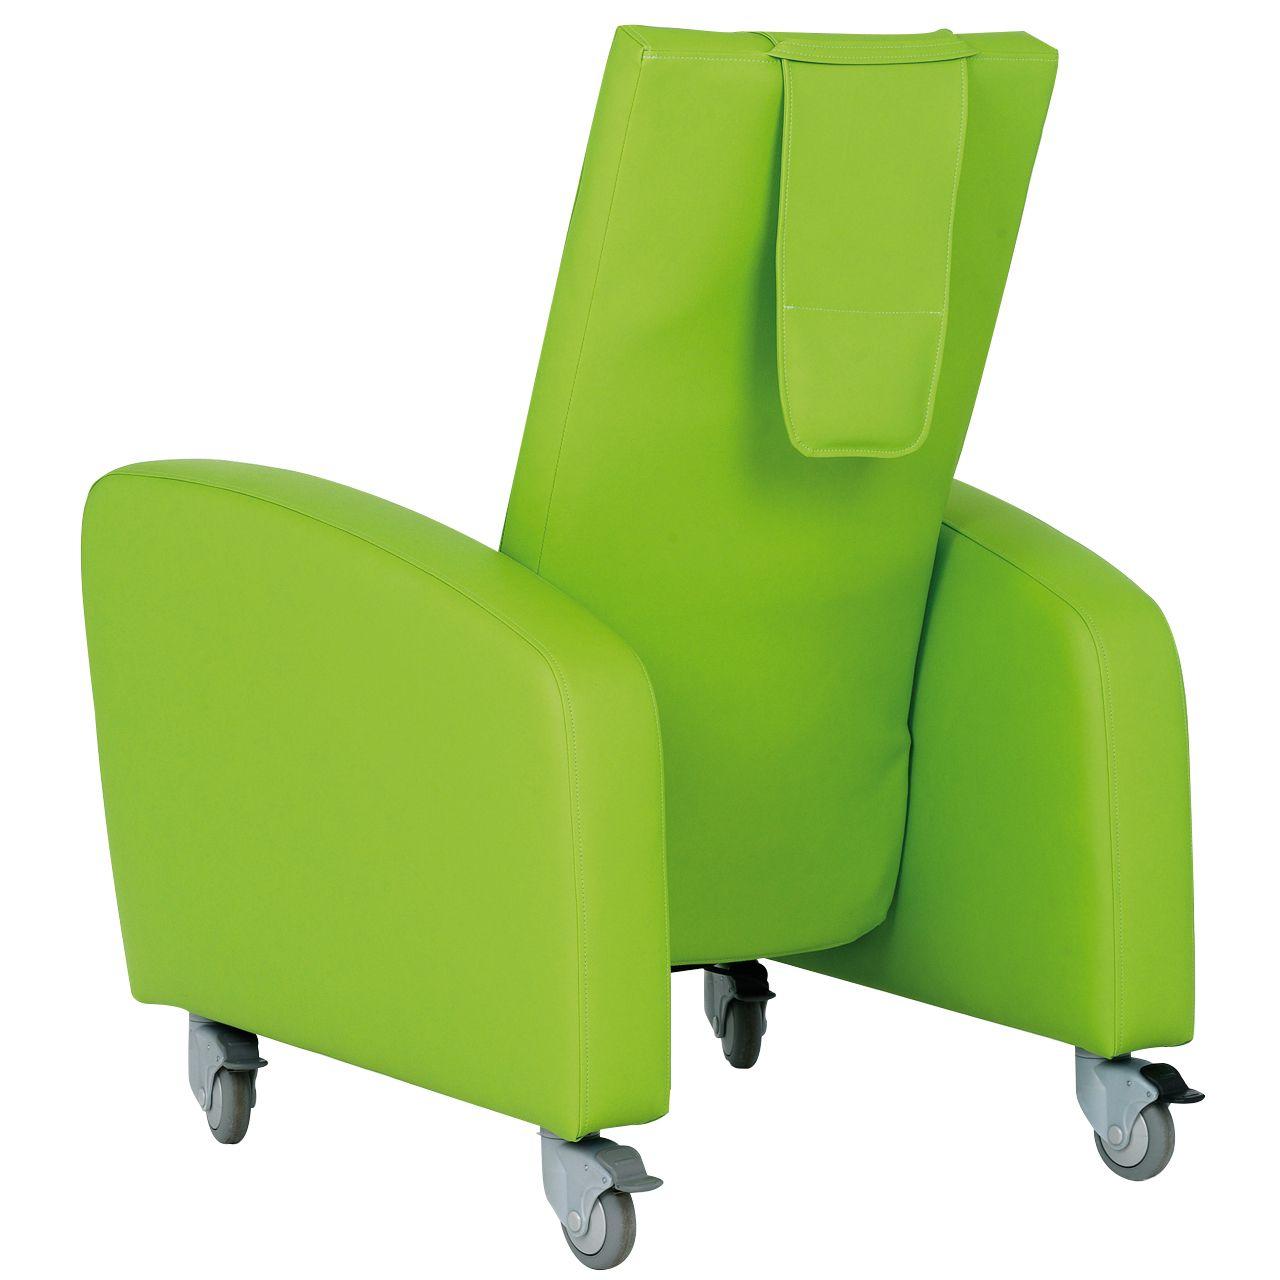 comfort general stoel zorg achterkant